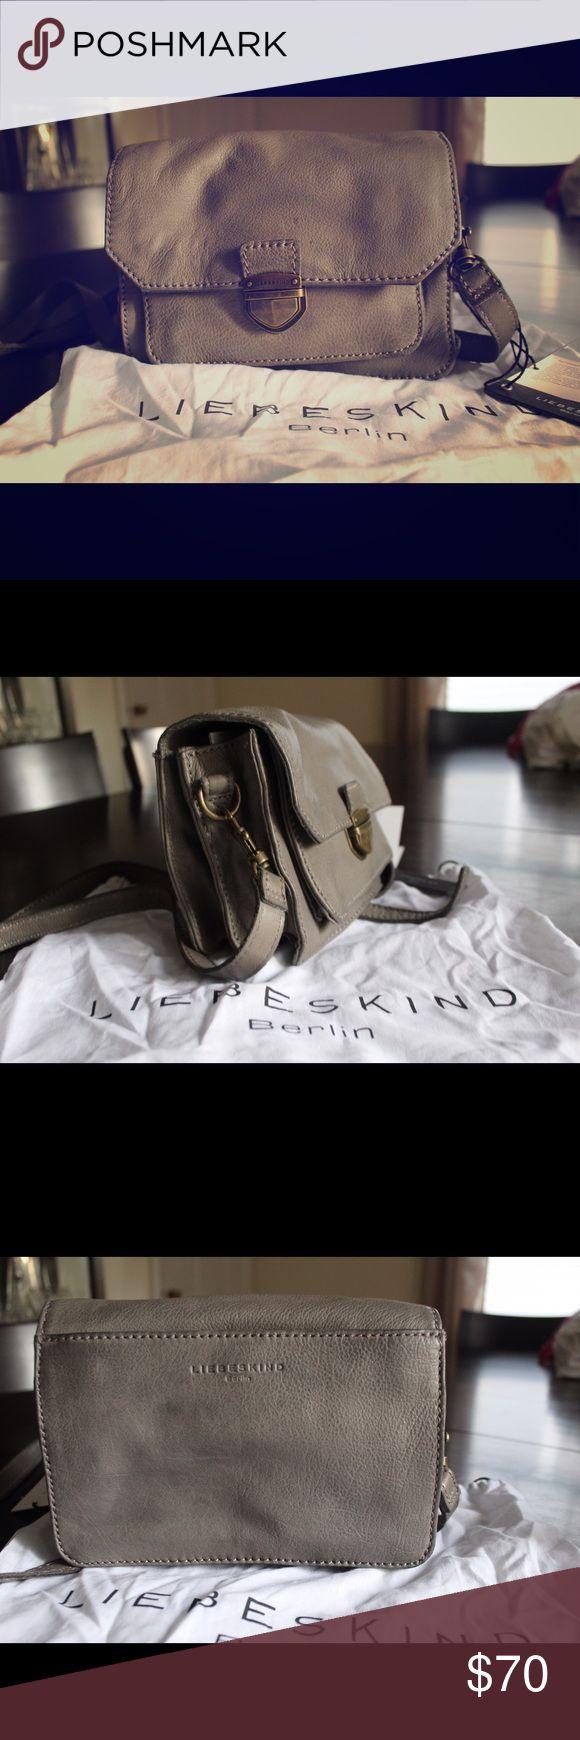 Grey leather cross body bag, liebeskind Berlin Grey leather cross body bag from Liebeskind Berlin, unused and in dust bag Liebeskind Bags Crossbody Bags